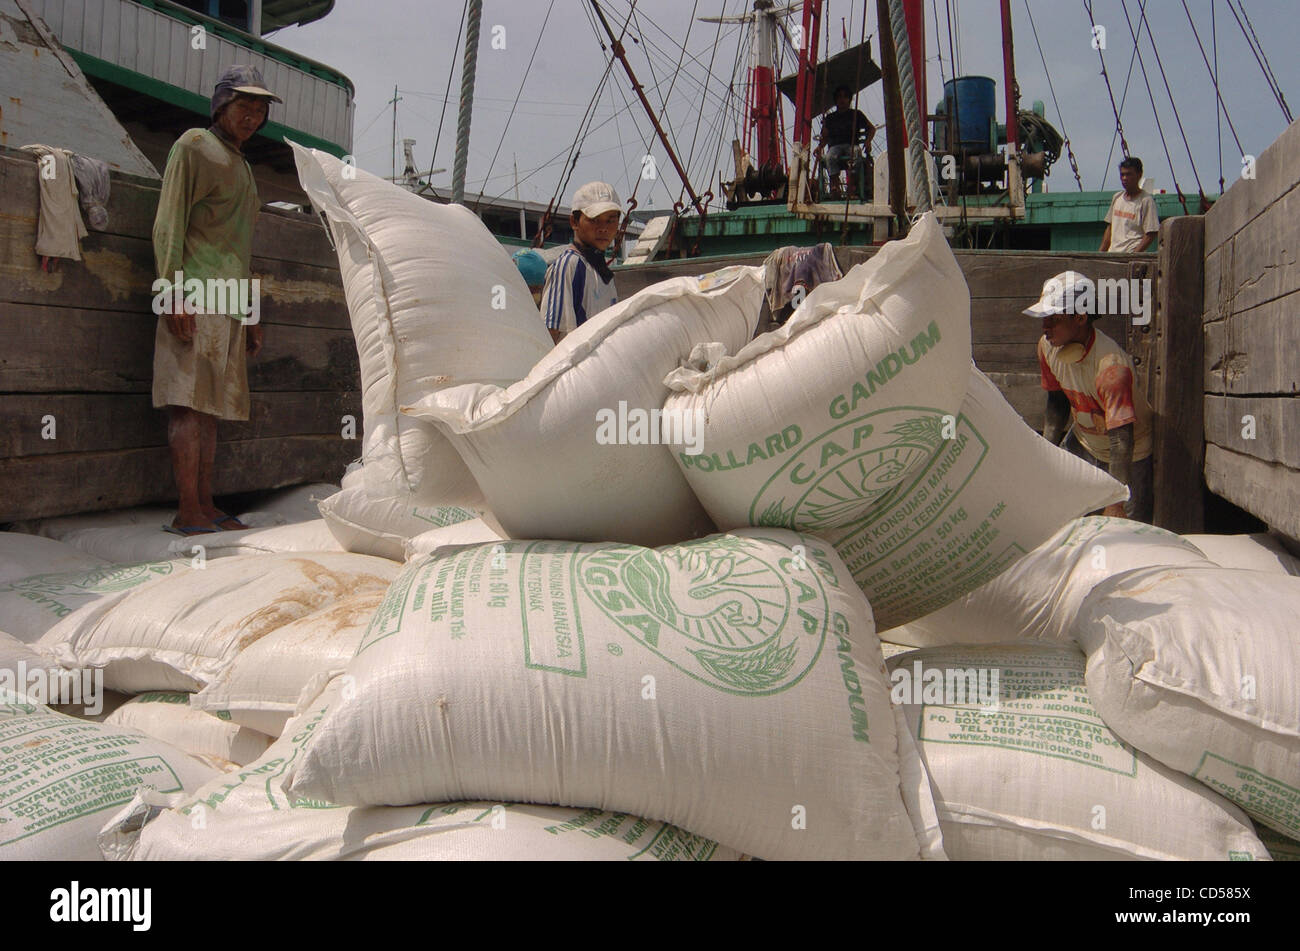 labourers load sacks of wheat onto a ship at the sunda kelapa port